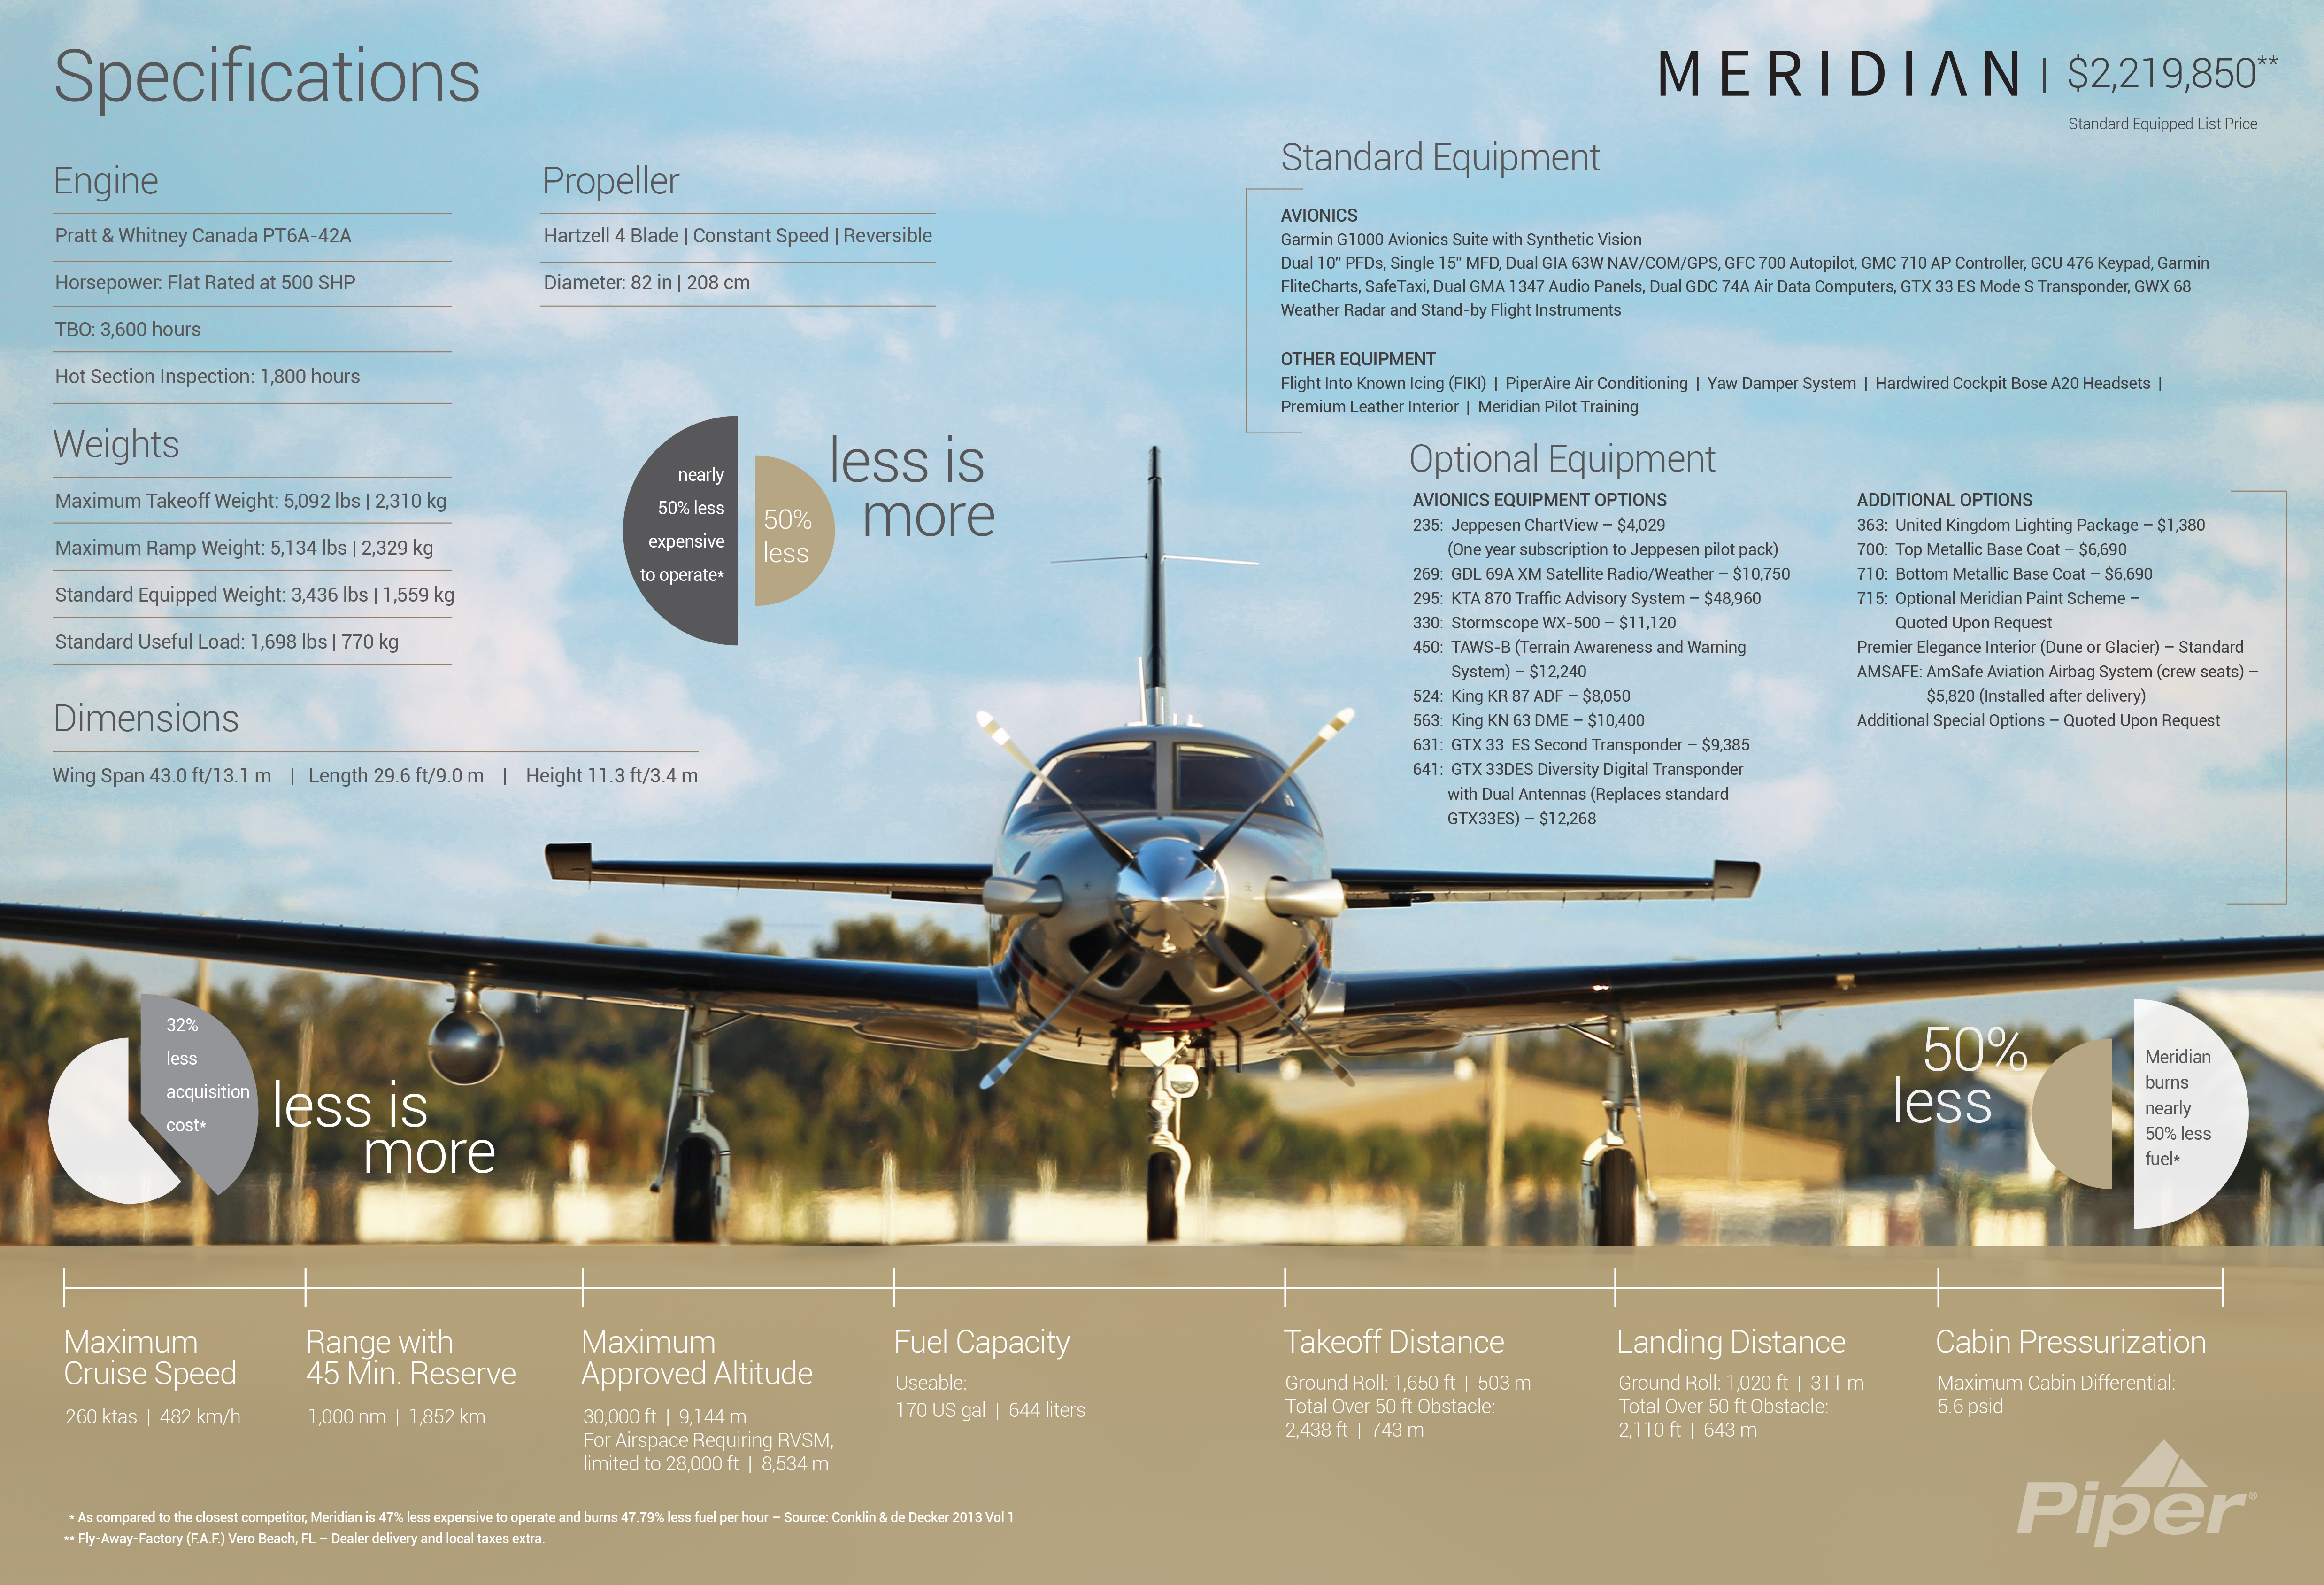 2014 Piper Meridian Brochure